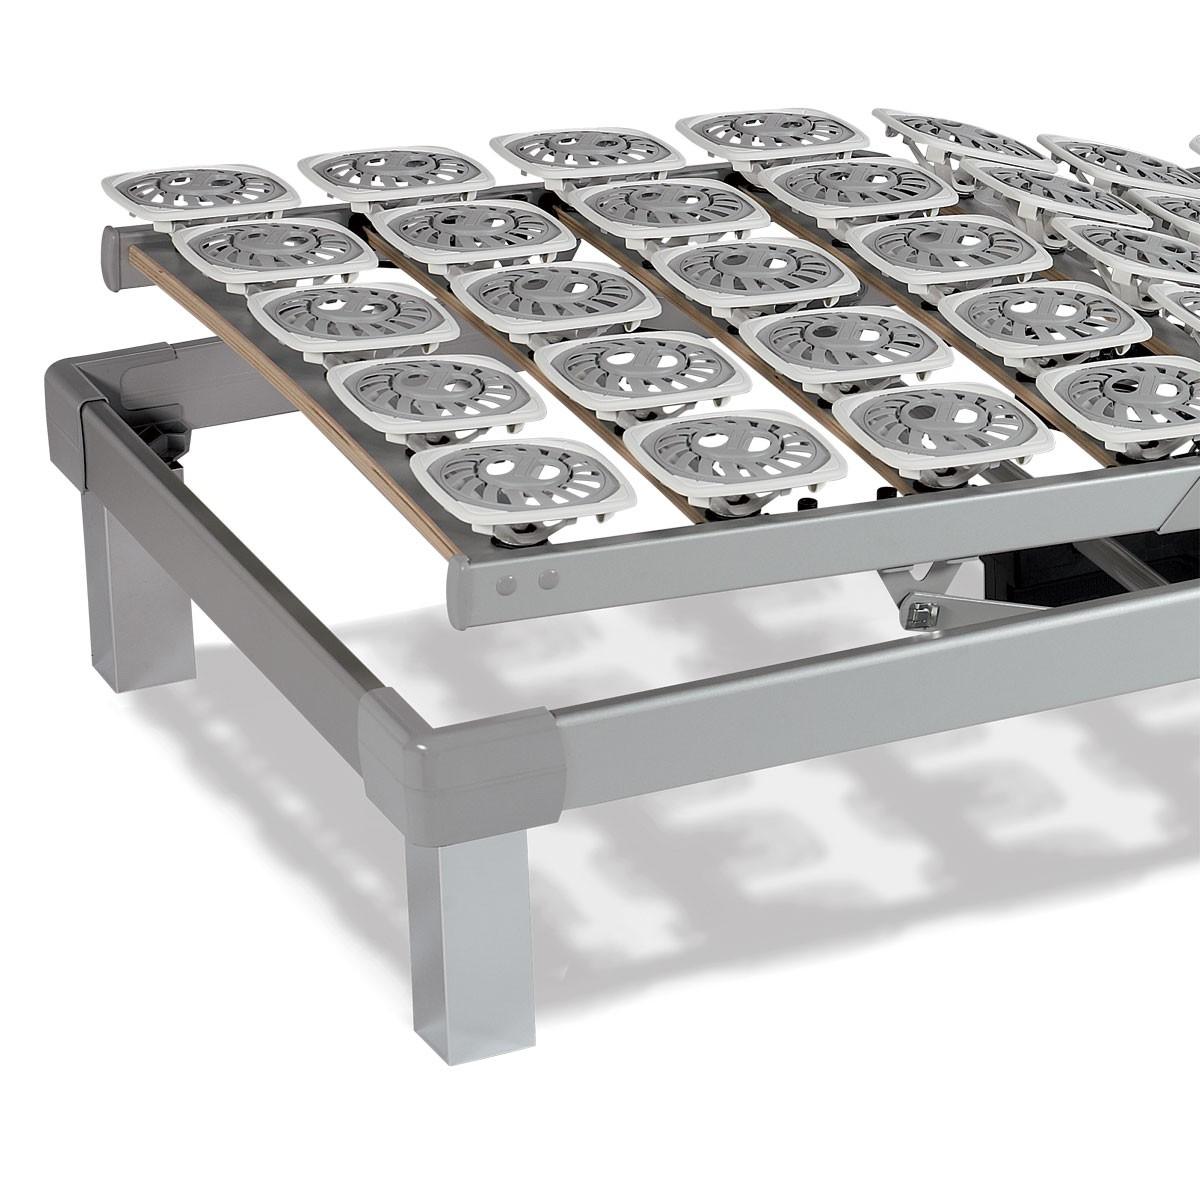 flex cloud 2000 frame tempur tempur mattress frames. Black Bedroom Furniture Sets. Home Design Ideas